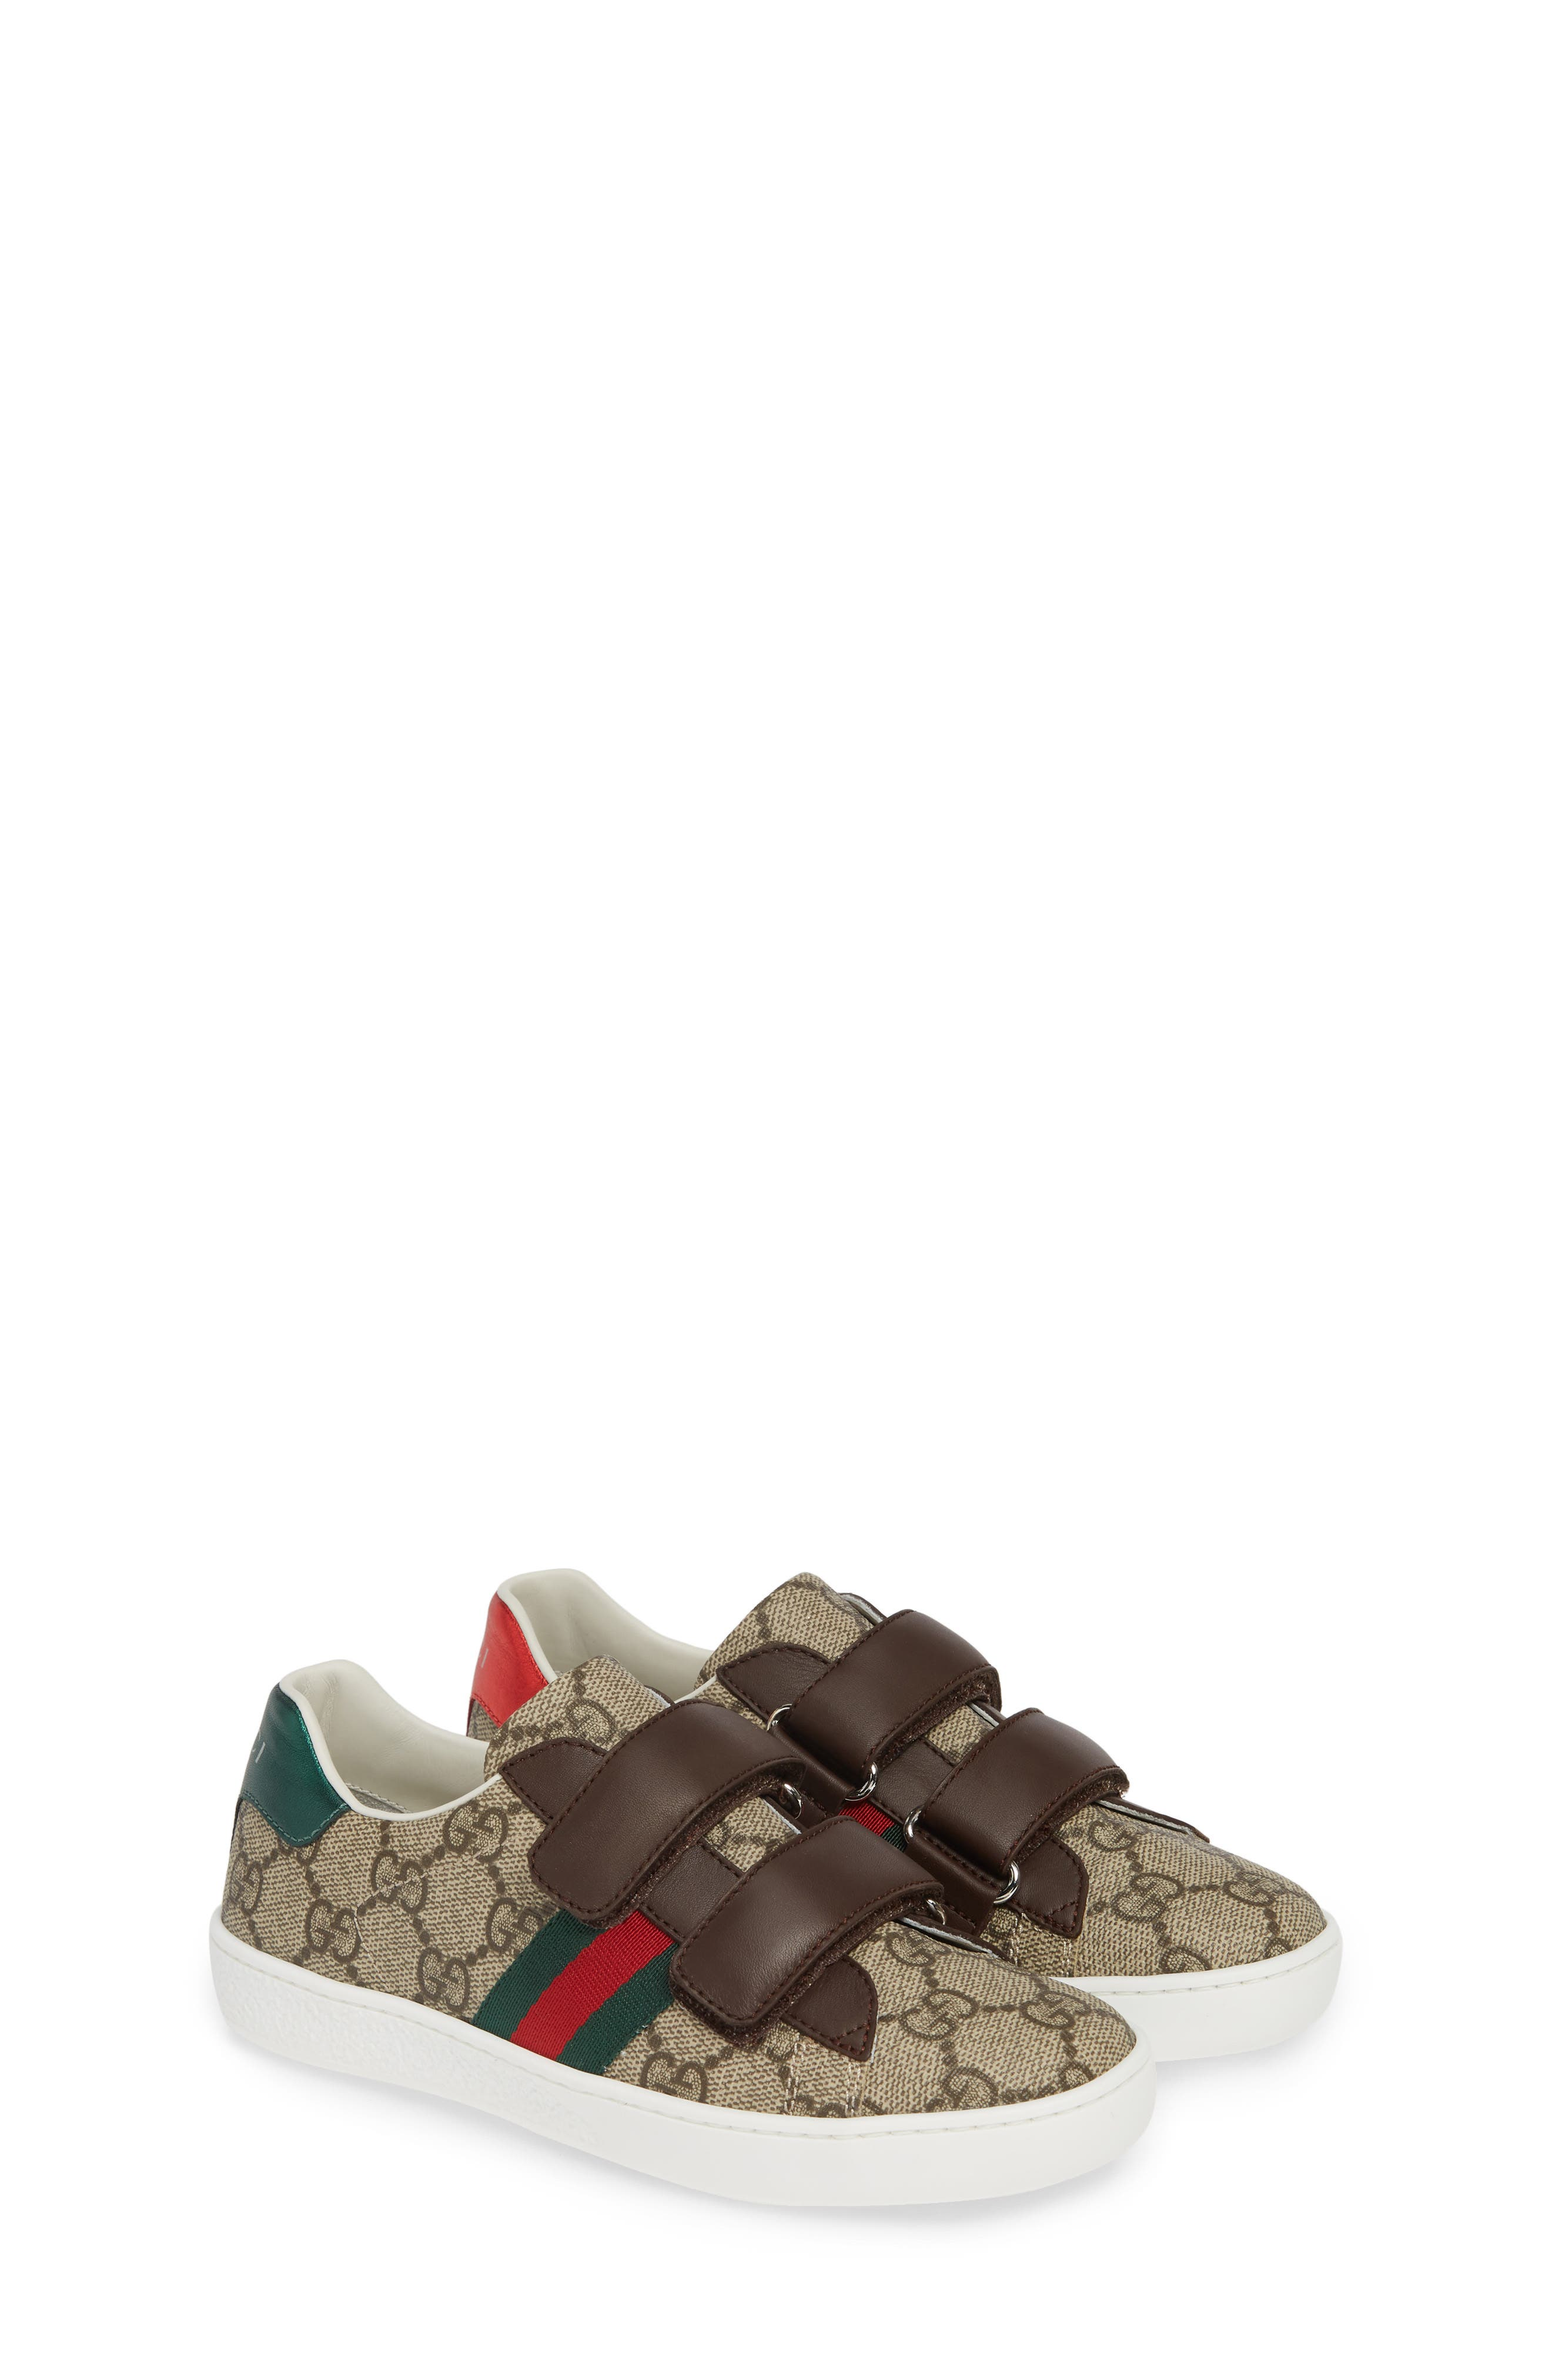 GUCCI, New Ace Monogram Sneaker, Alternate thumbnail 2, color, BEIGE